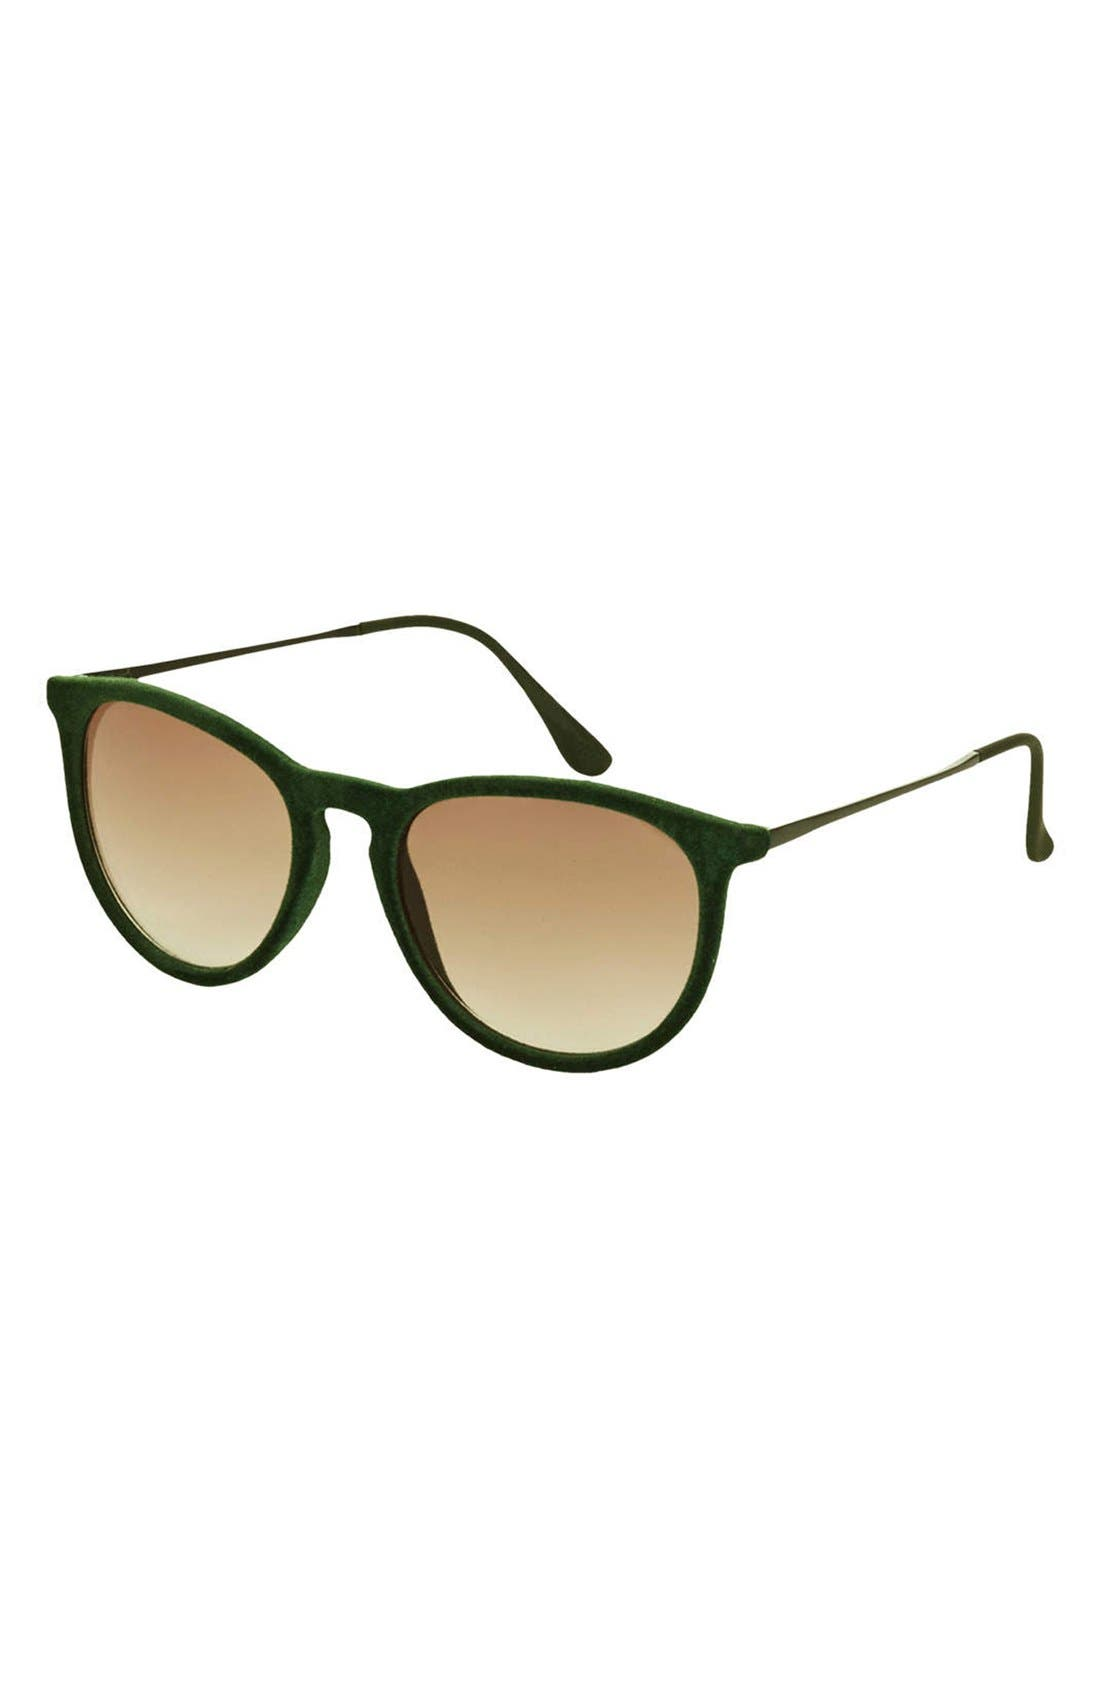 Main Image - Topshop 'Revo' 53mm Velour Sunglasses